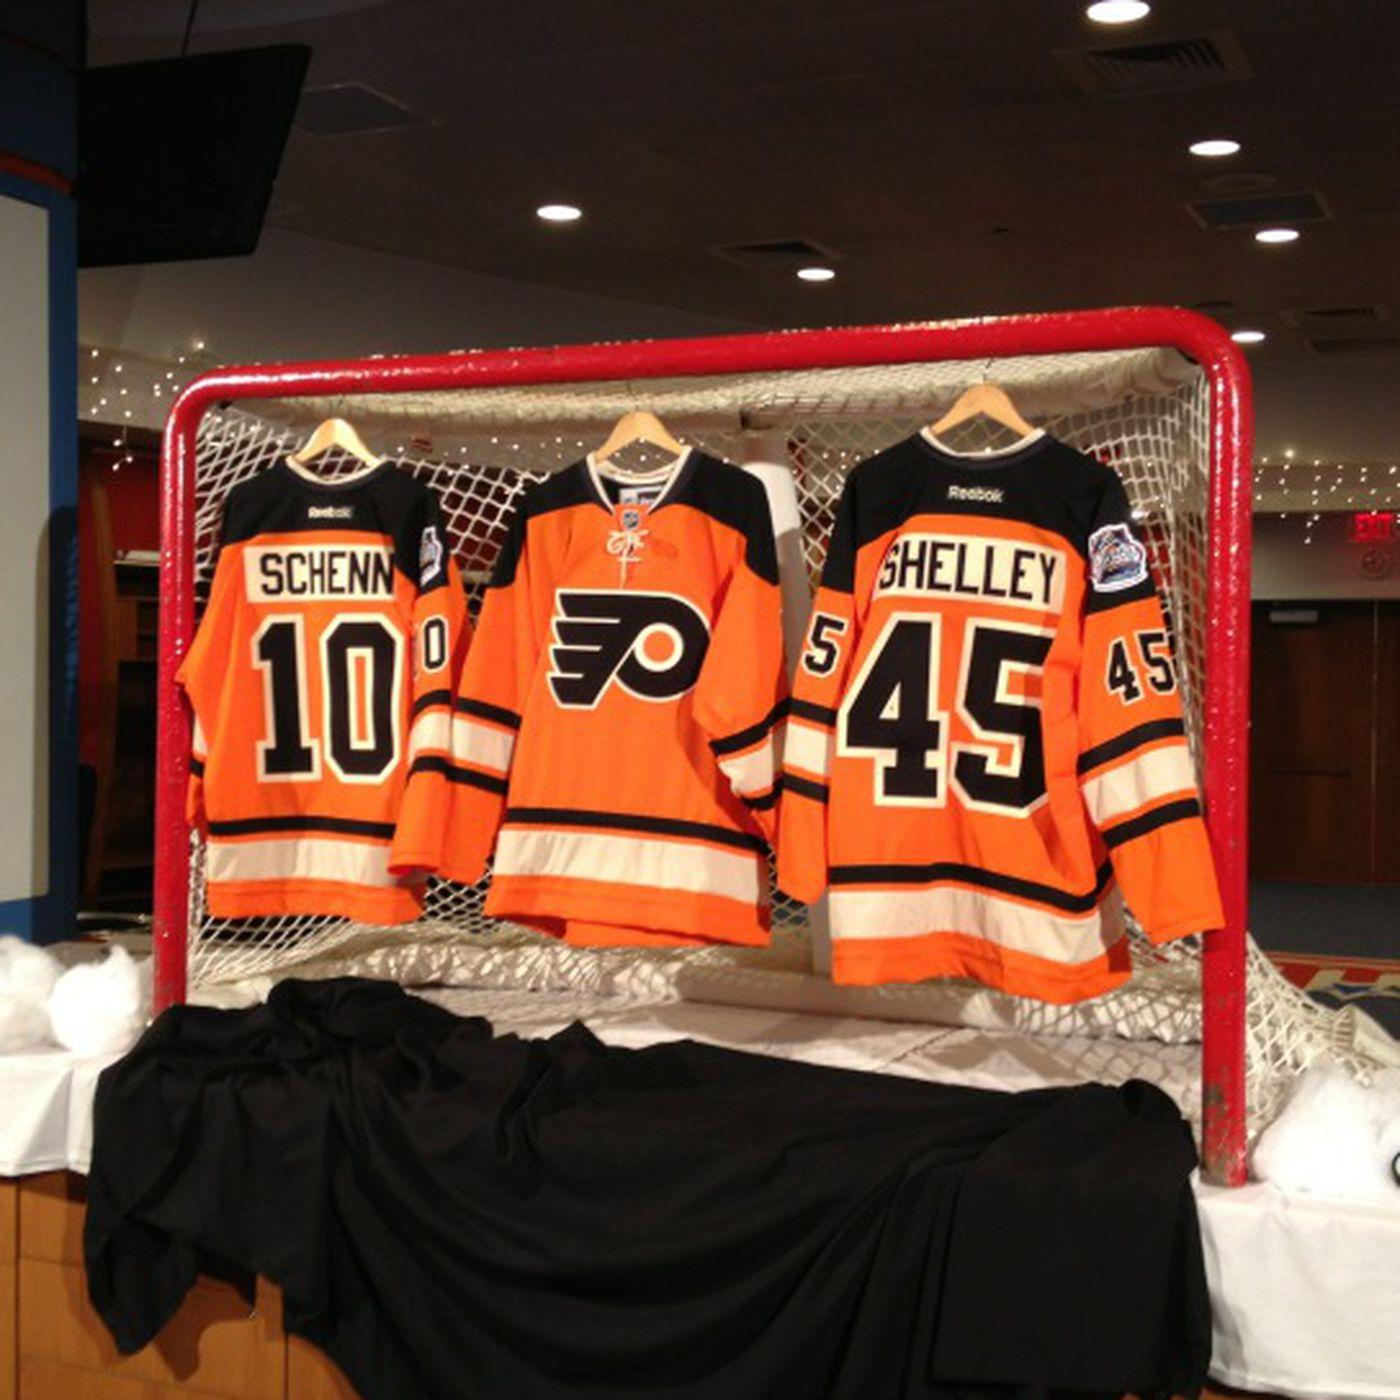 Philadelphia Flyers Winter Classic Jerseys  Sort of a disappointment ... dada6b52c